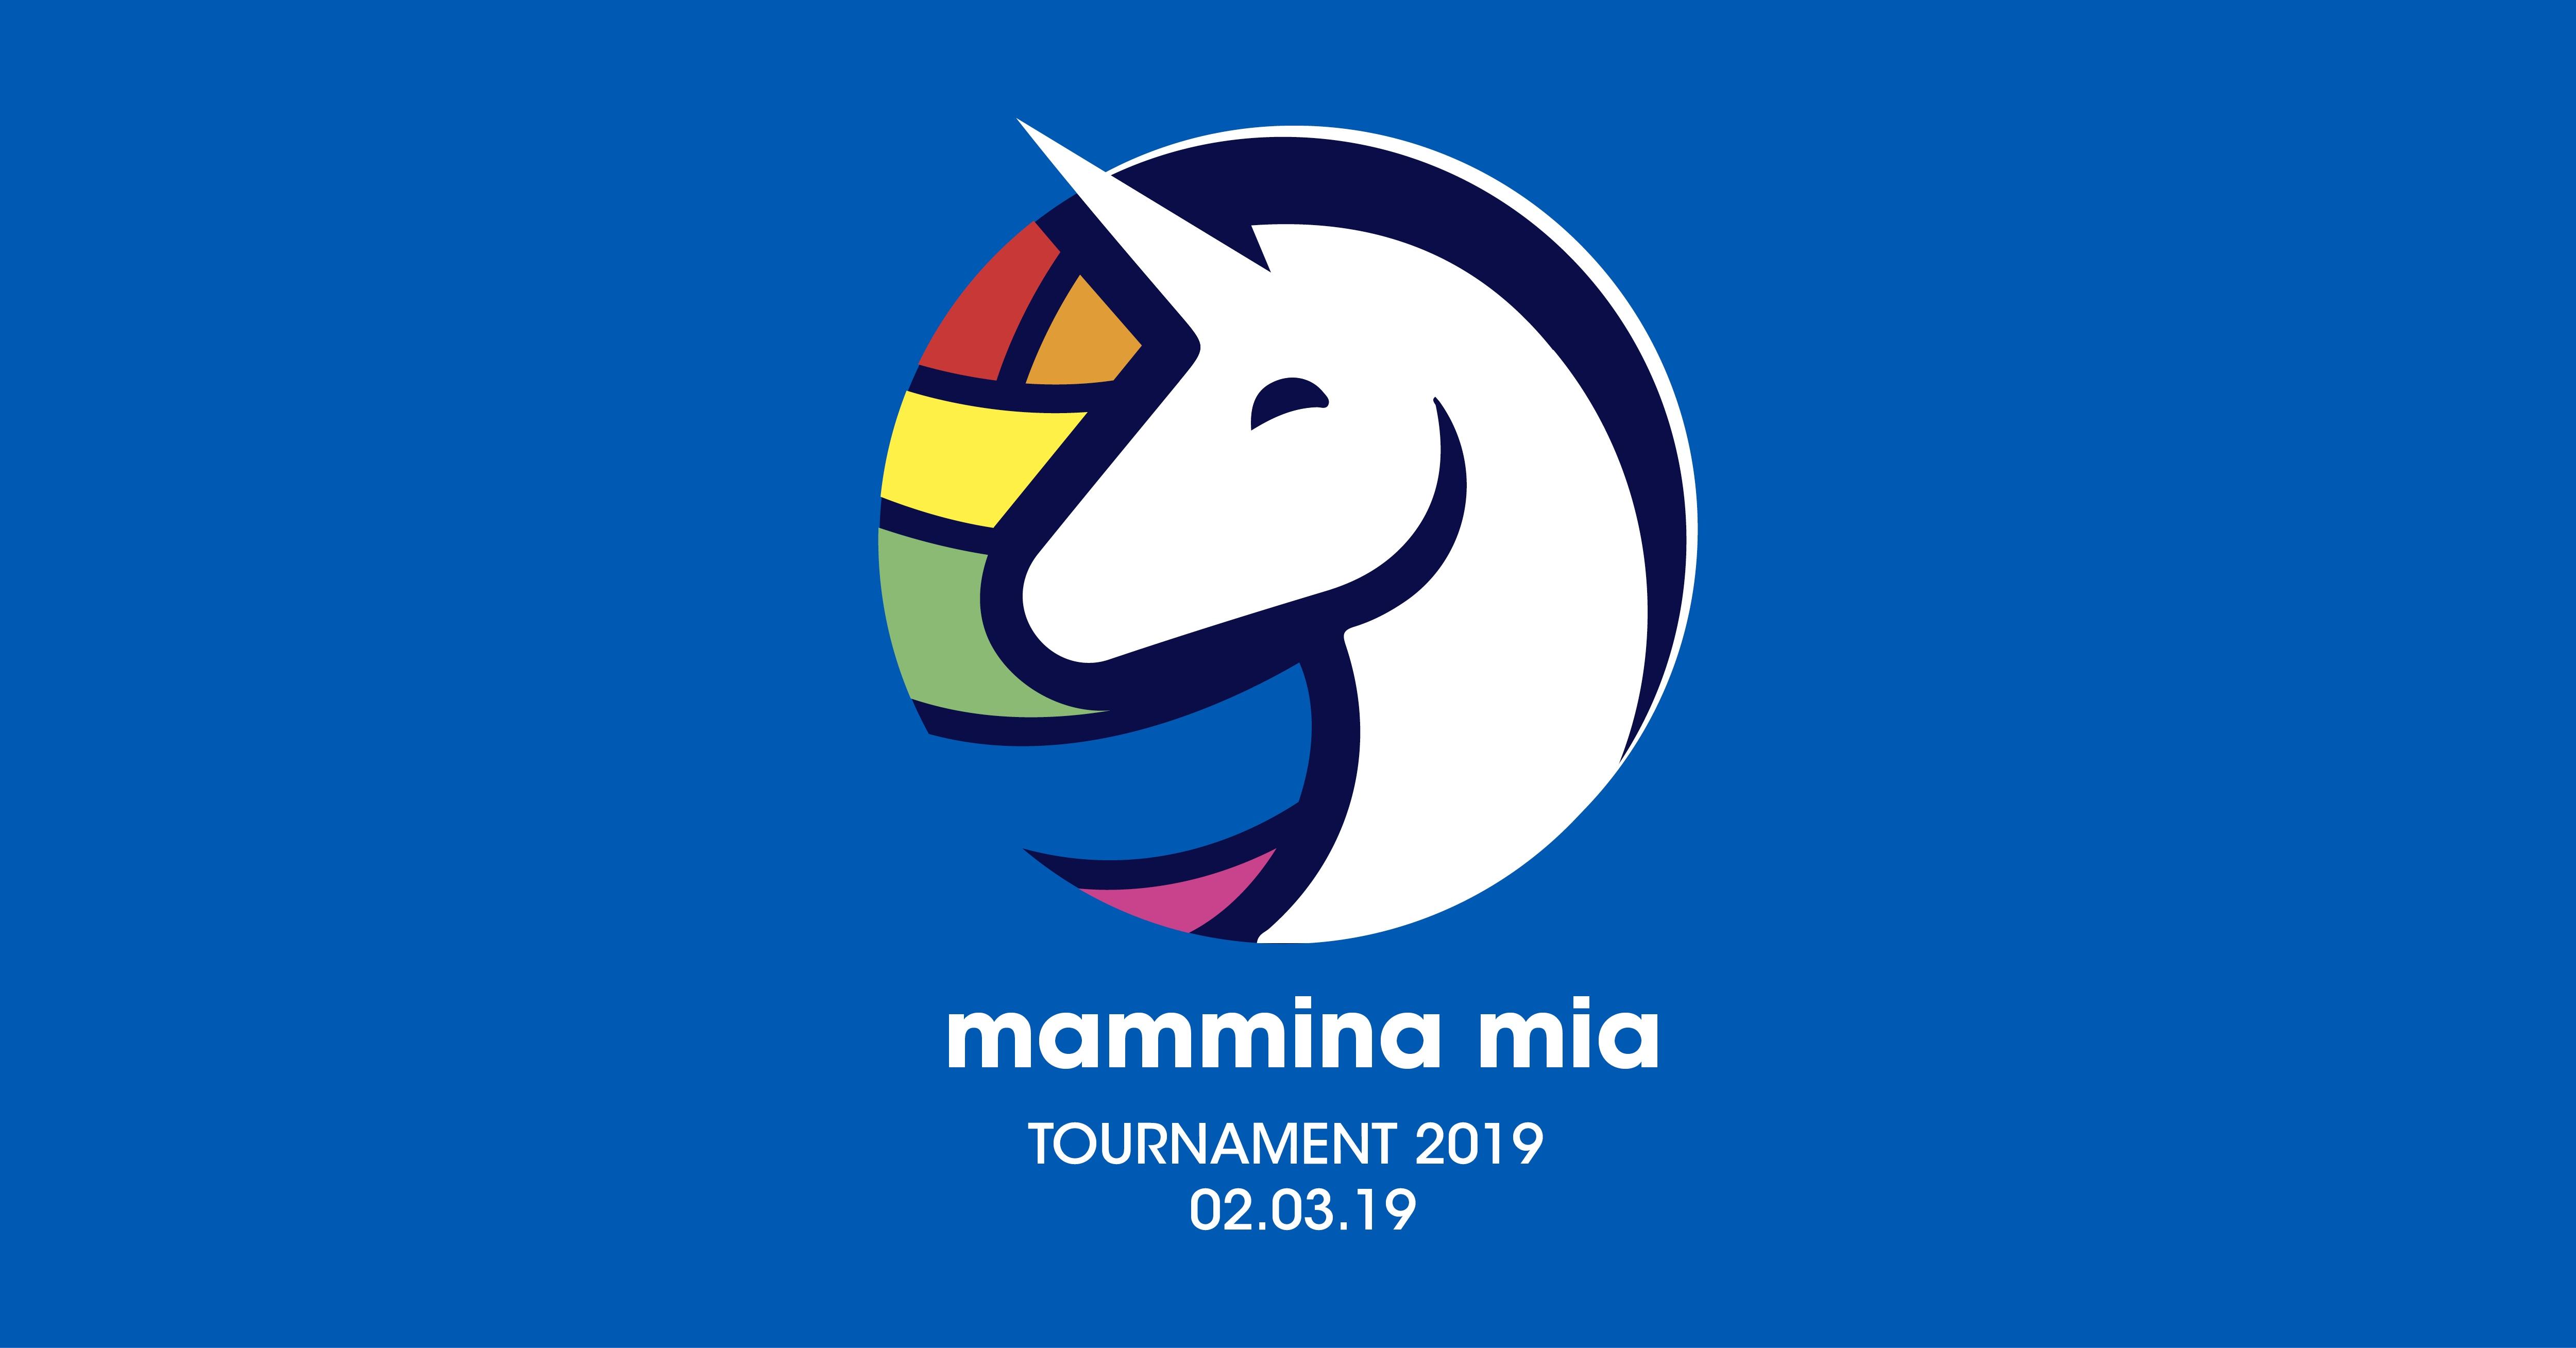 MamminaMia 2019